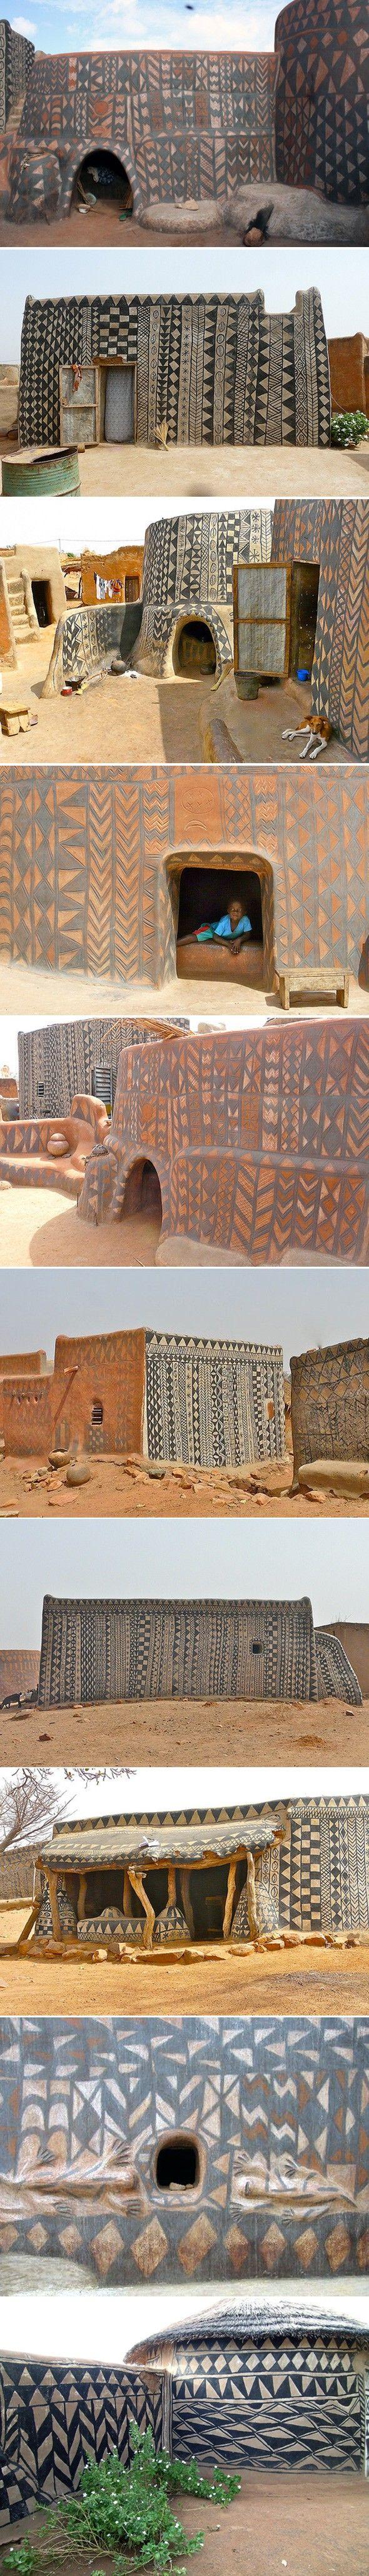 Maisons peintes au Burkina Faso - Journal du Design